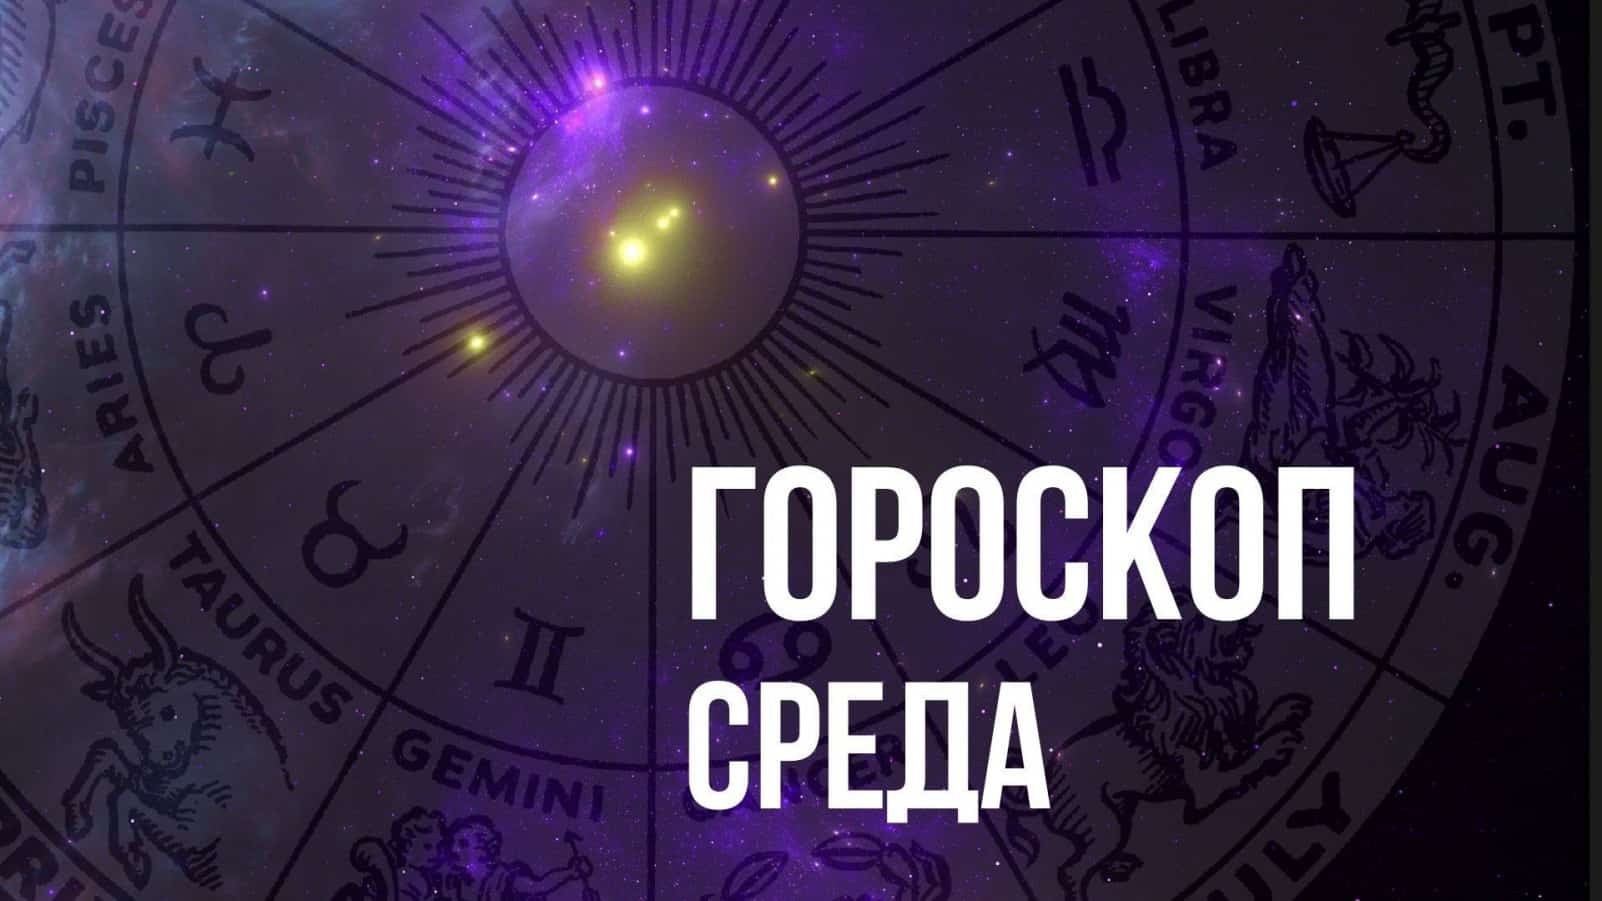 Гороскоп на среду 25 августа для каждого знака Зодиака